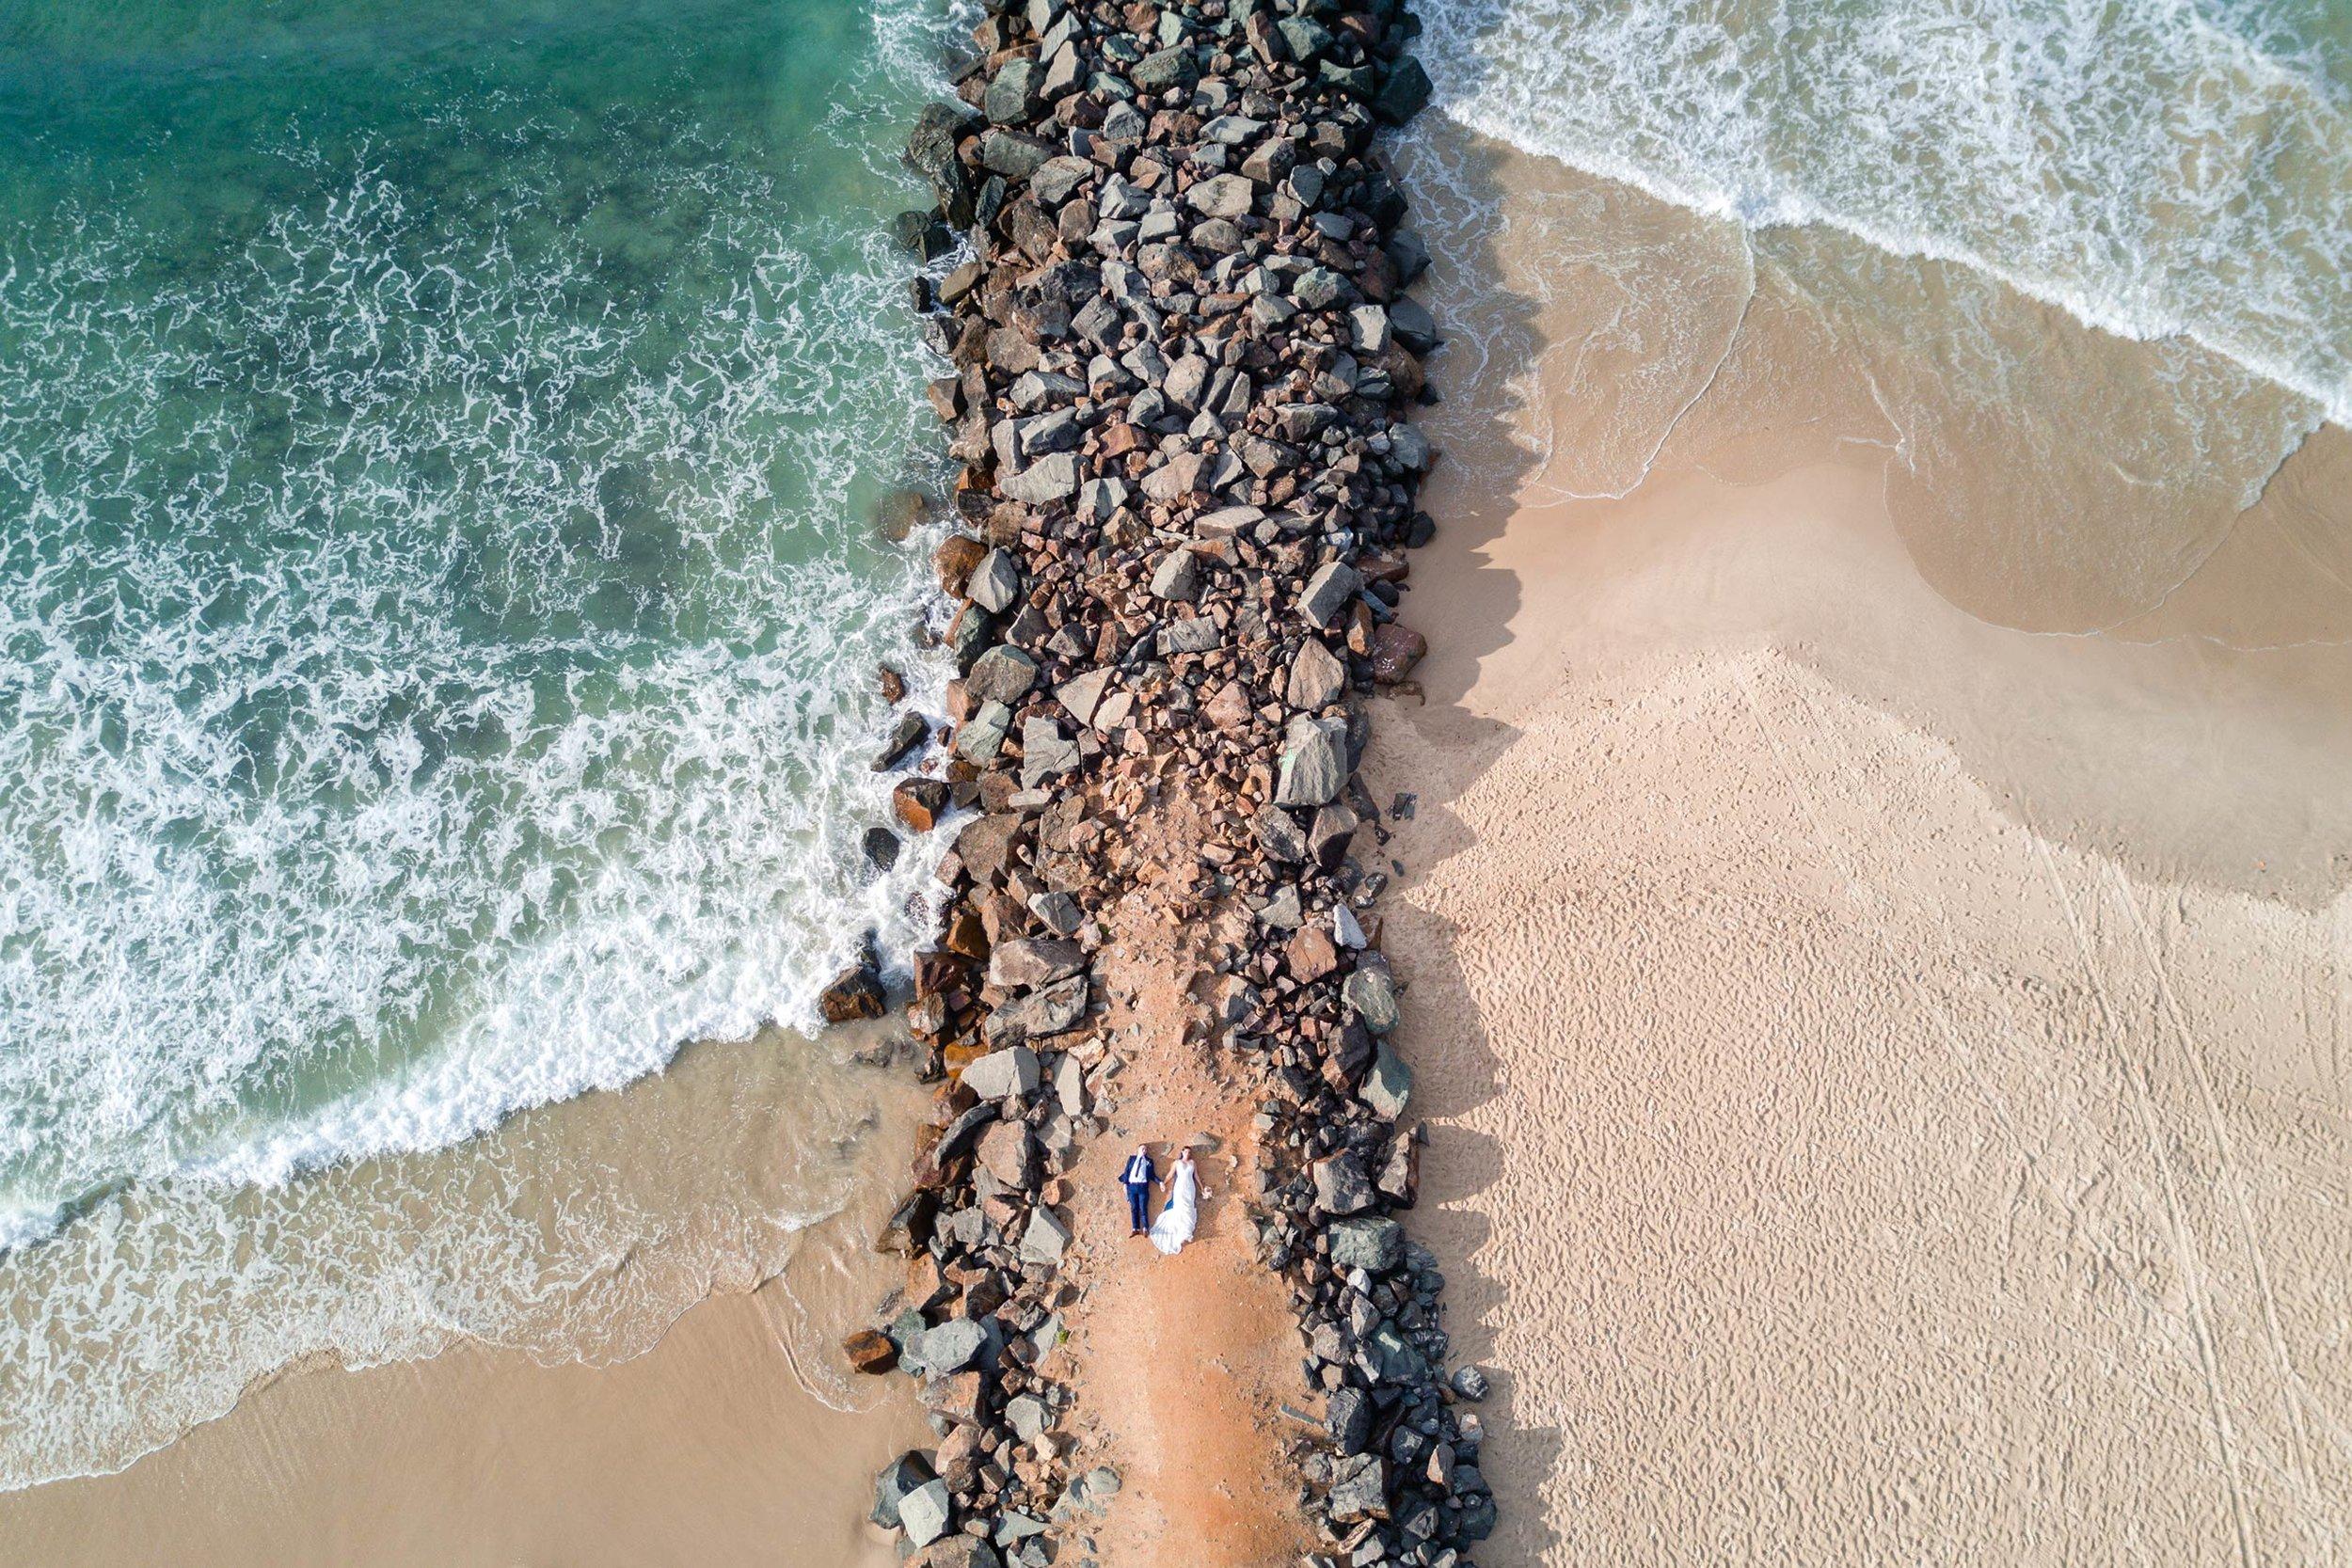 Noosa Beach to Caloundra Destination Wedding Drone Photographers, Queensland - Top Sunshine Coast, Australian Blog Pics